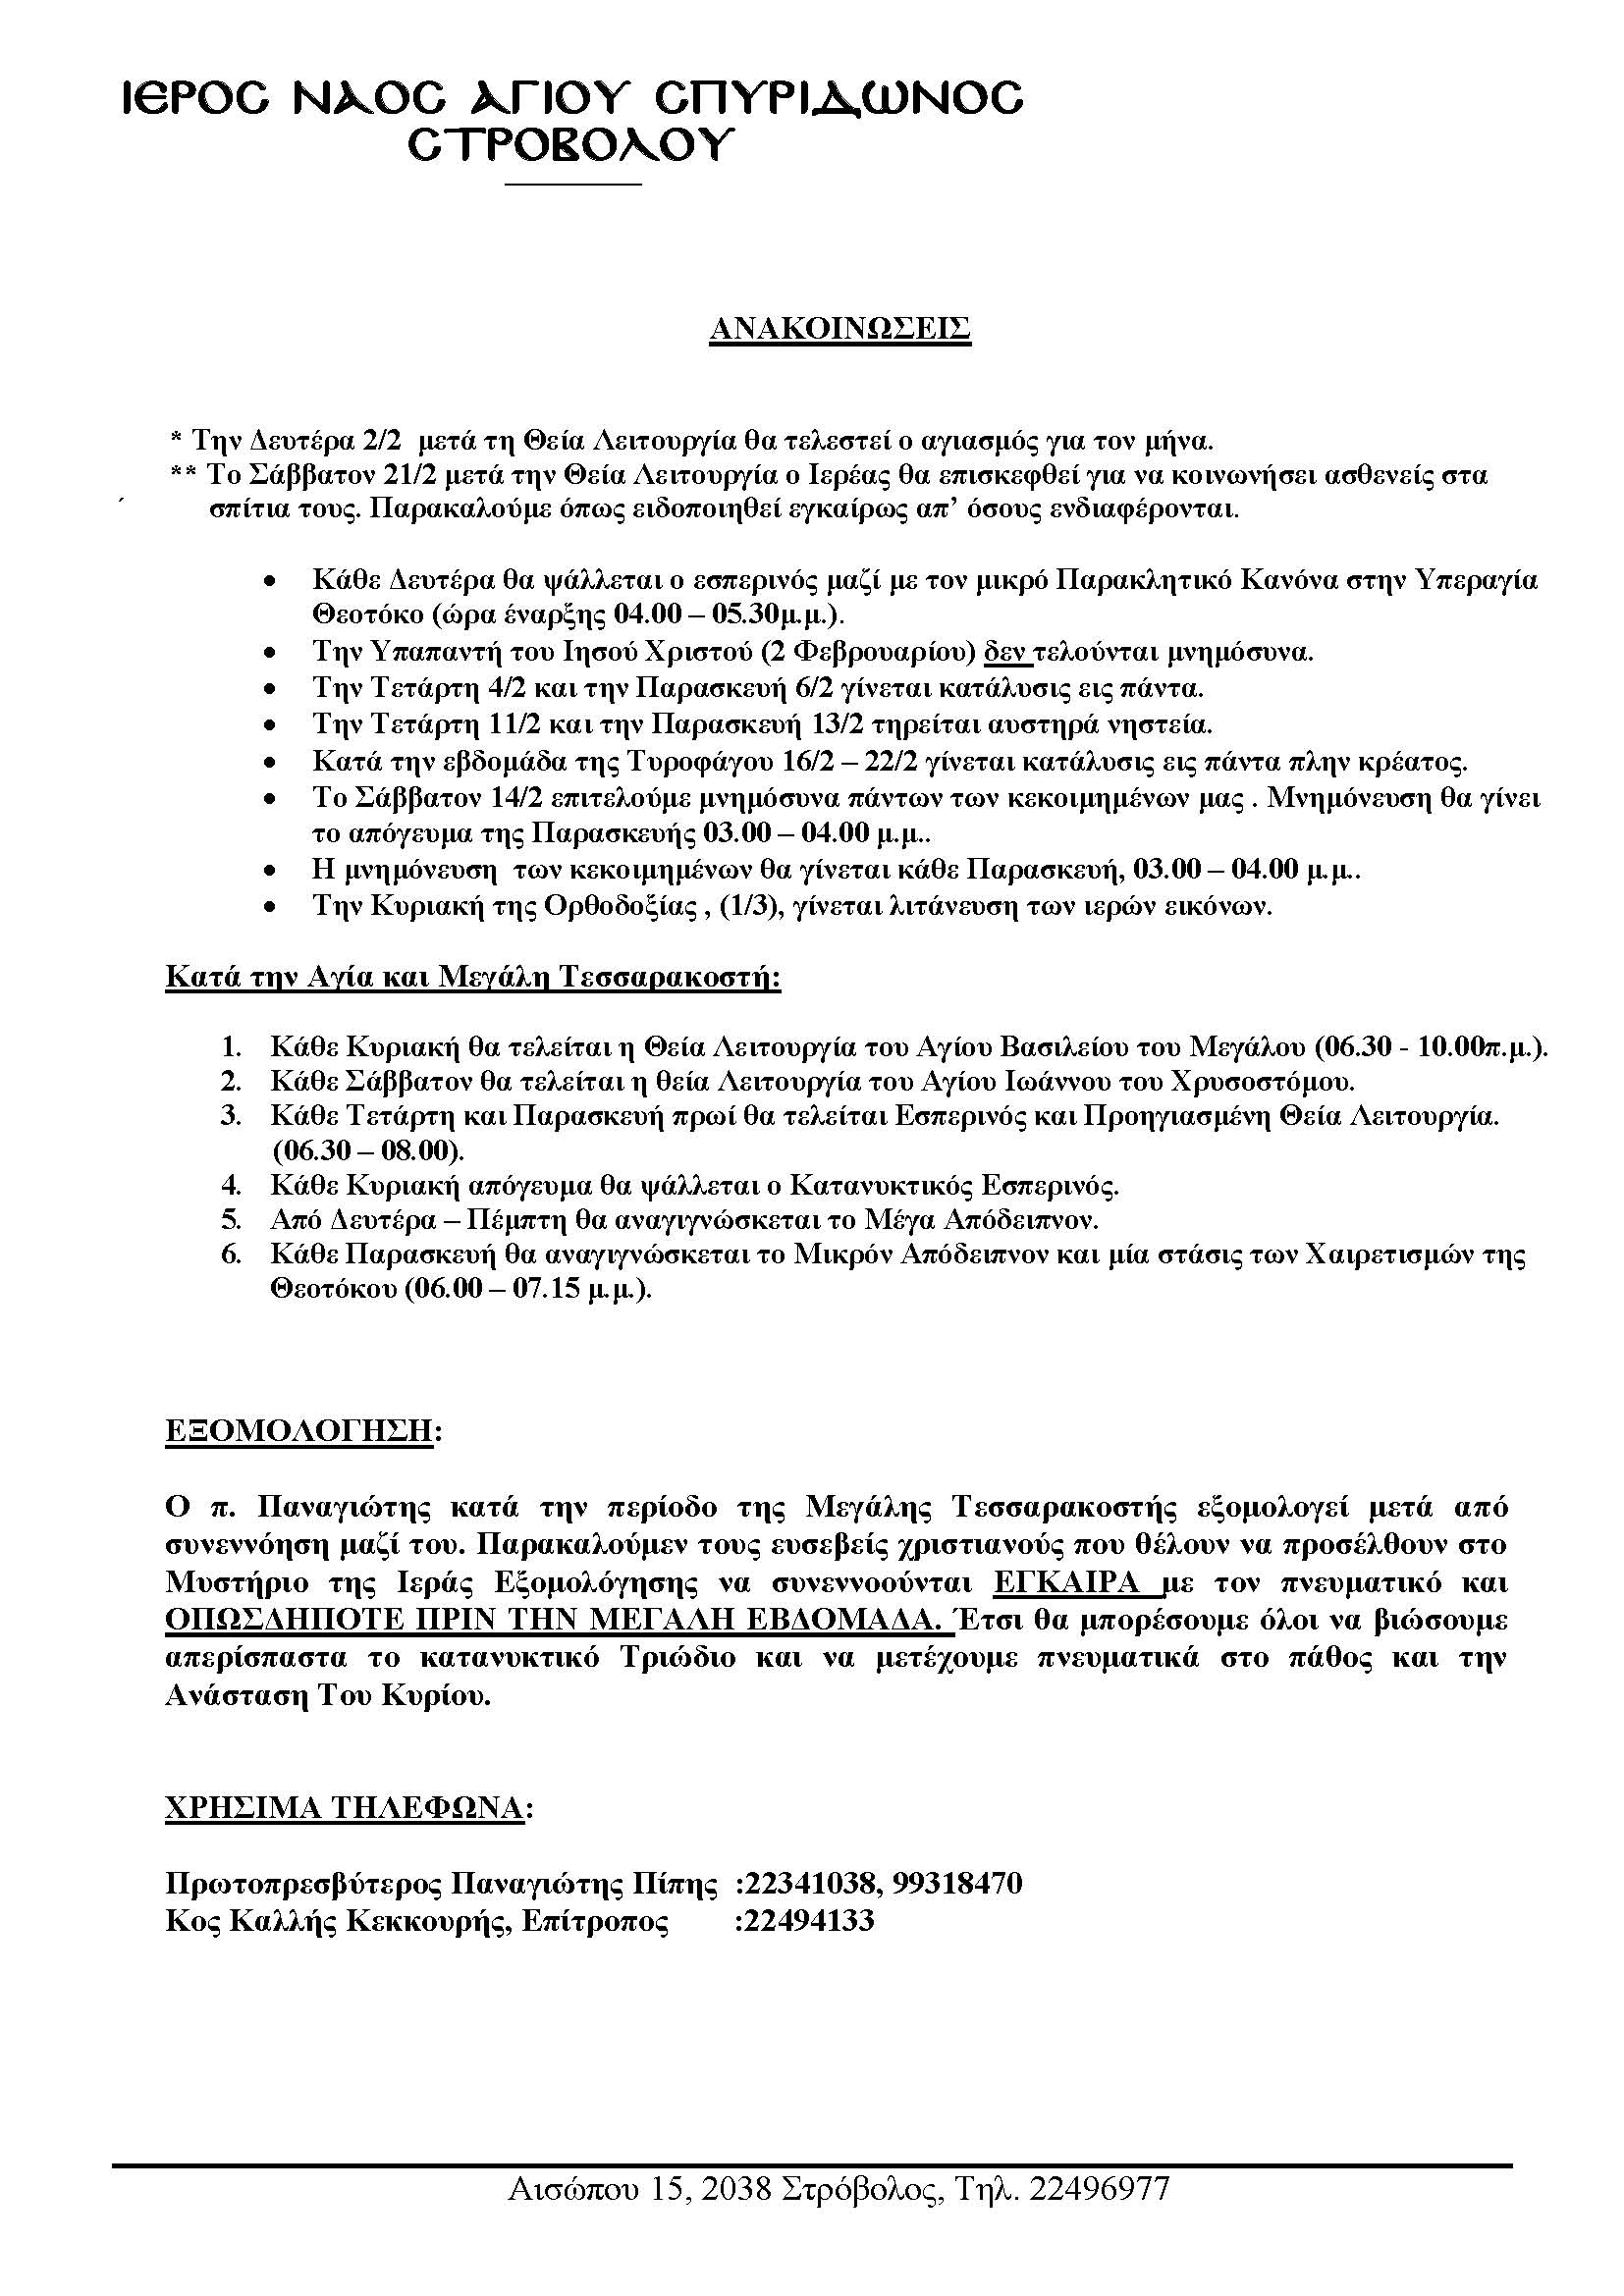 CHURCH-DINOS-FEBRUARY 2015_Page_2